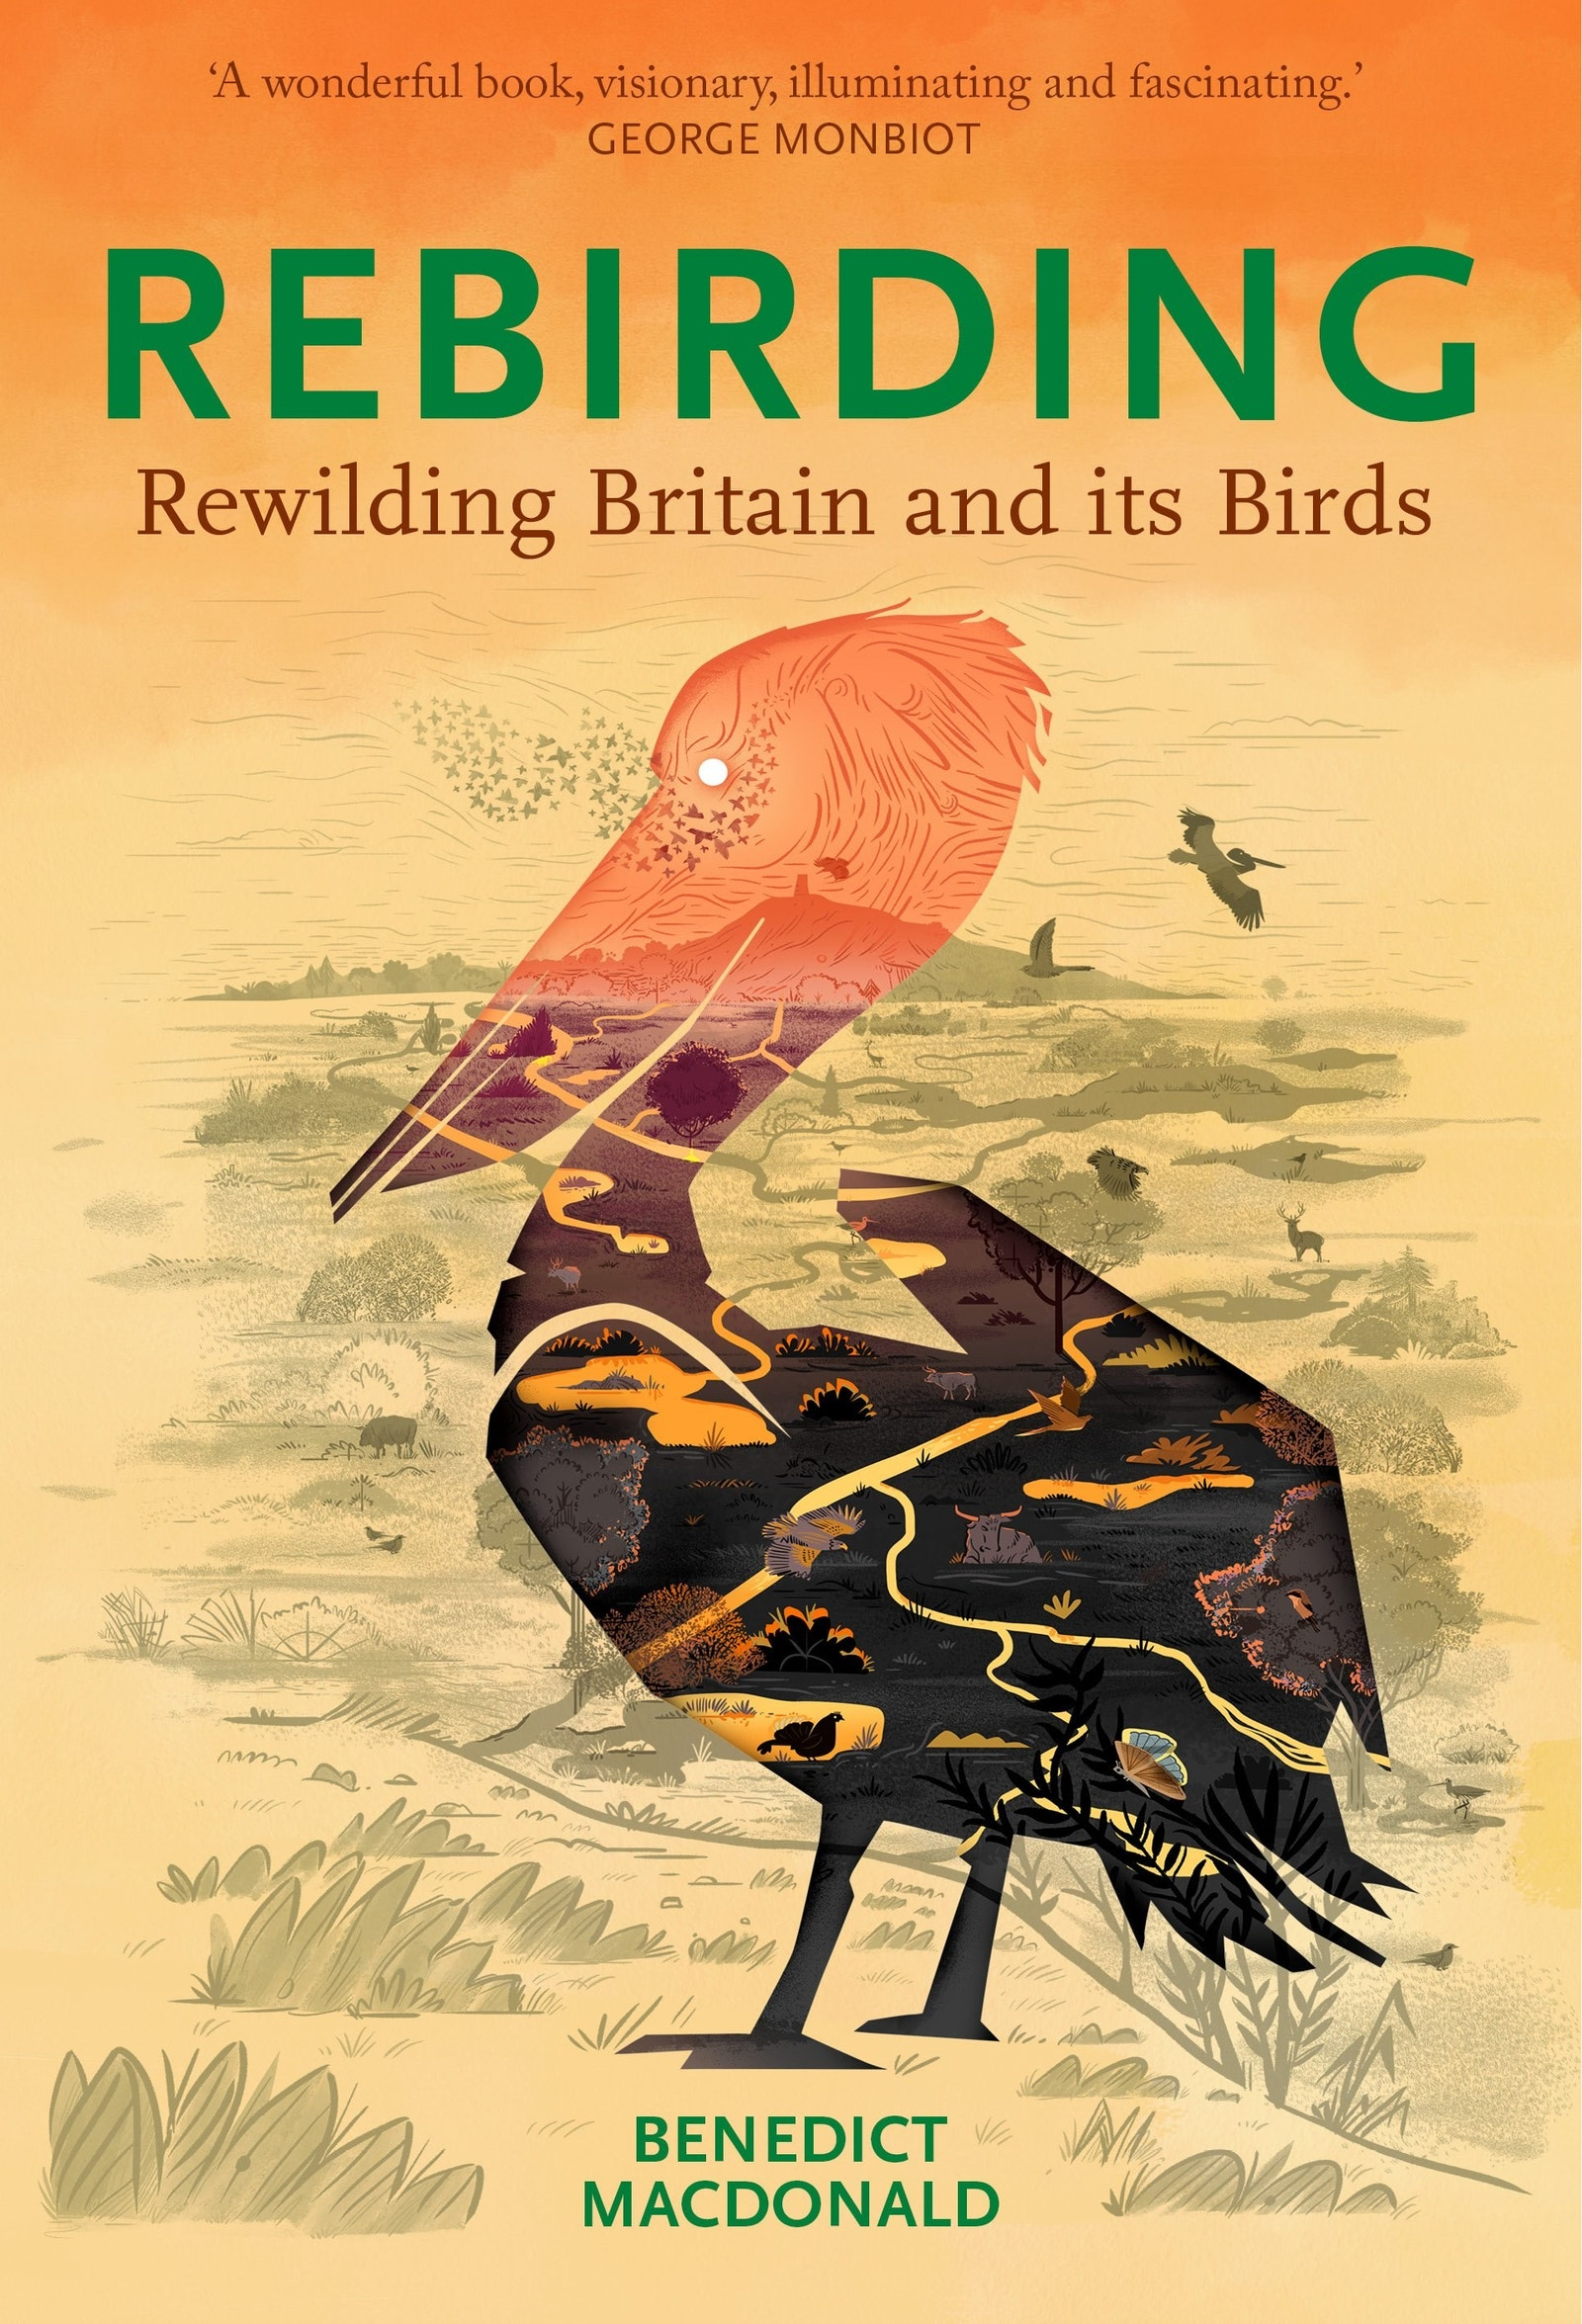 Rebirding Rewilding Britain and its Birds Macdonald front cover